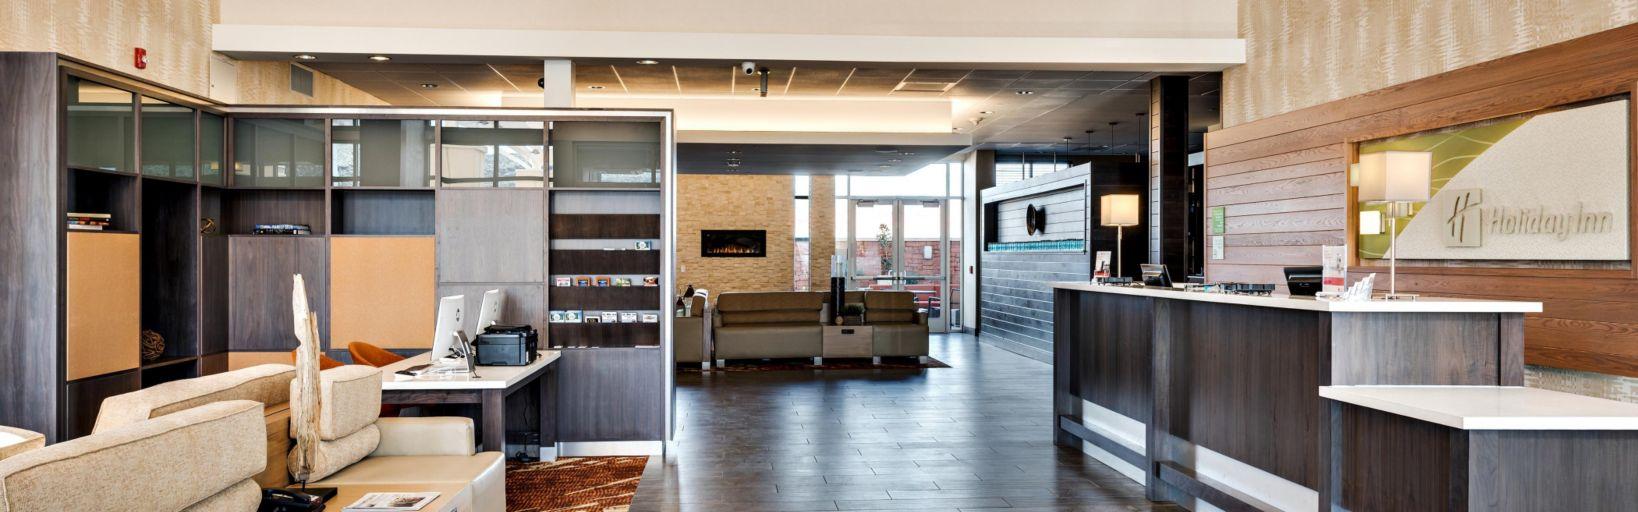 Hotel Lobby Holiday Inn St George Utah